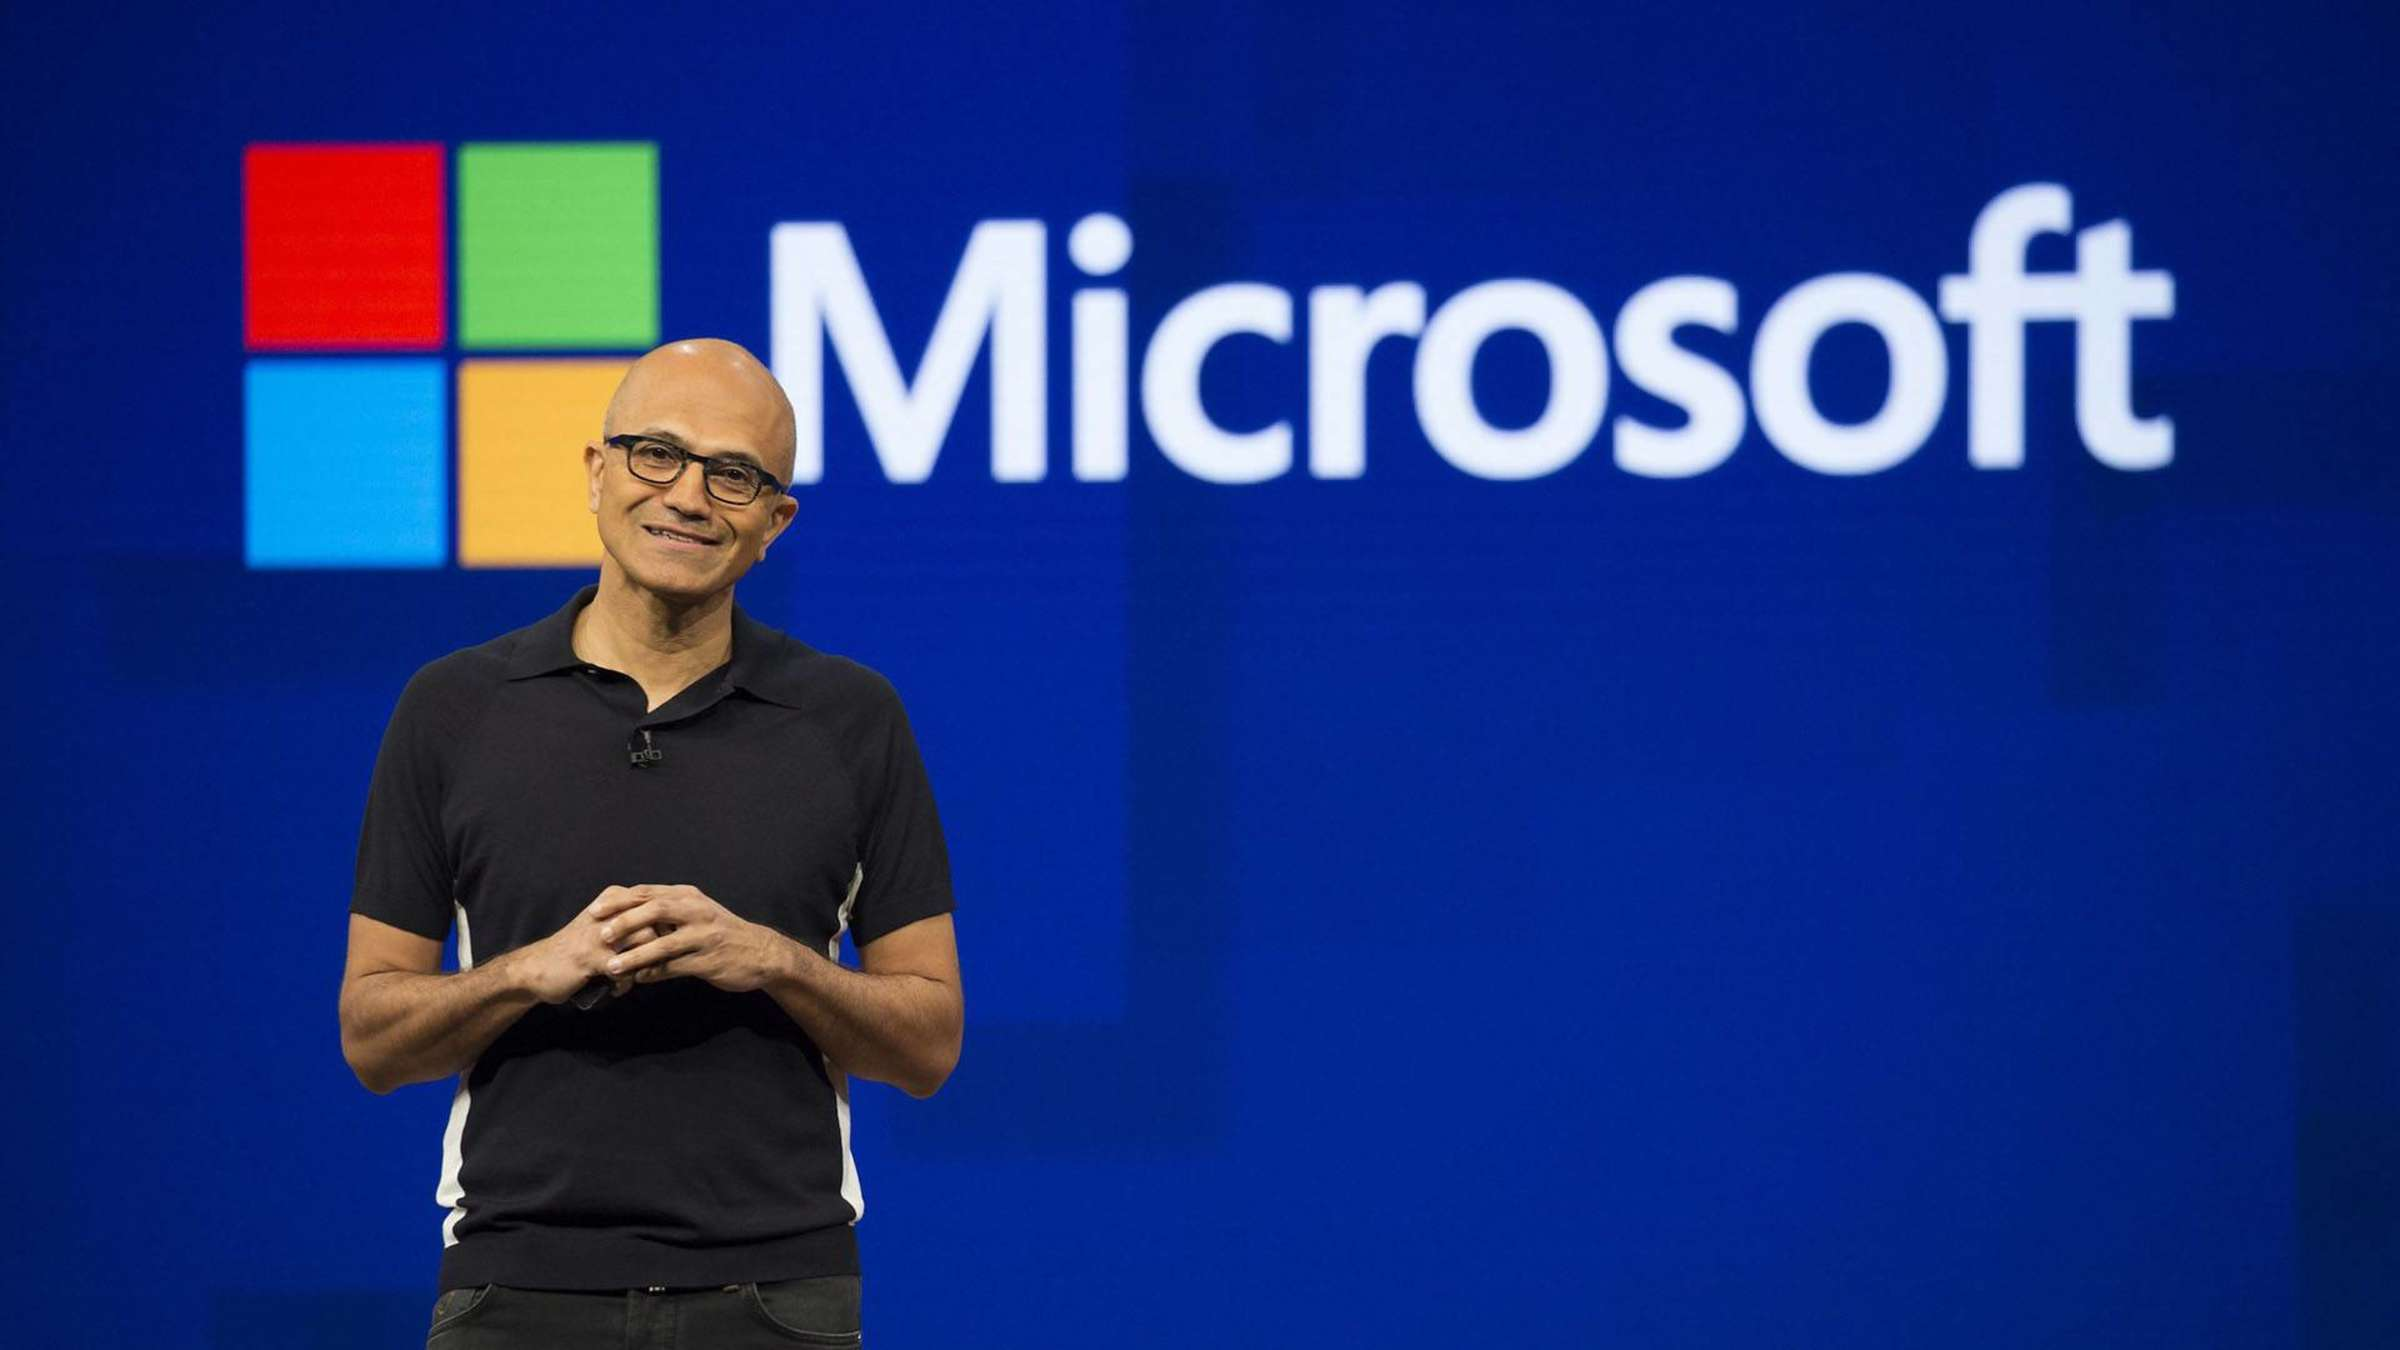 Microsoft apresenta receita de us$ 46,2 bi e excede as expectativas